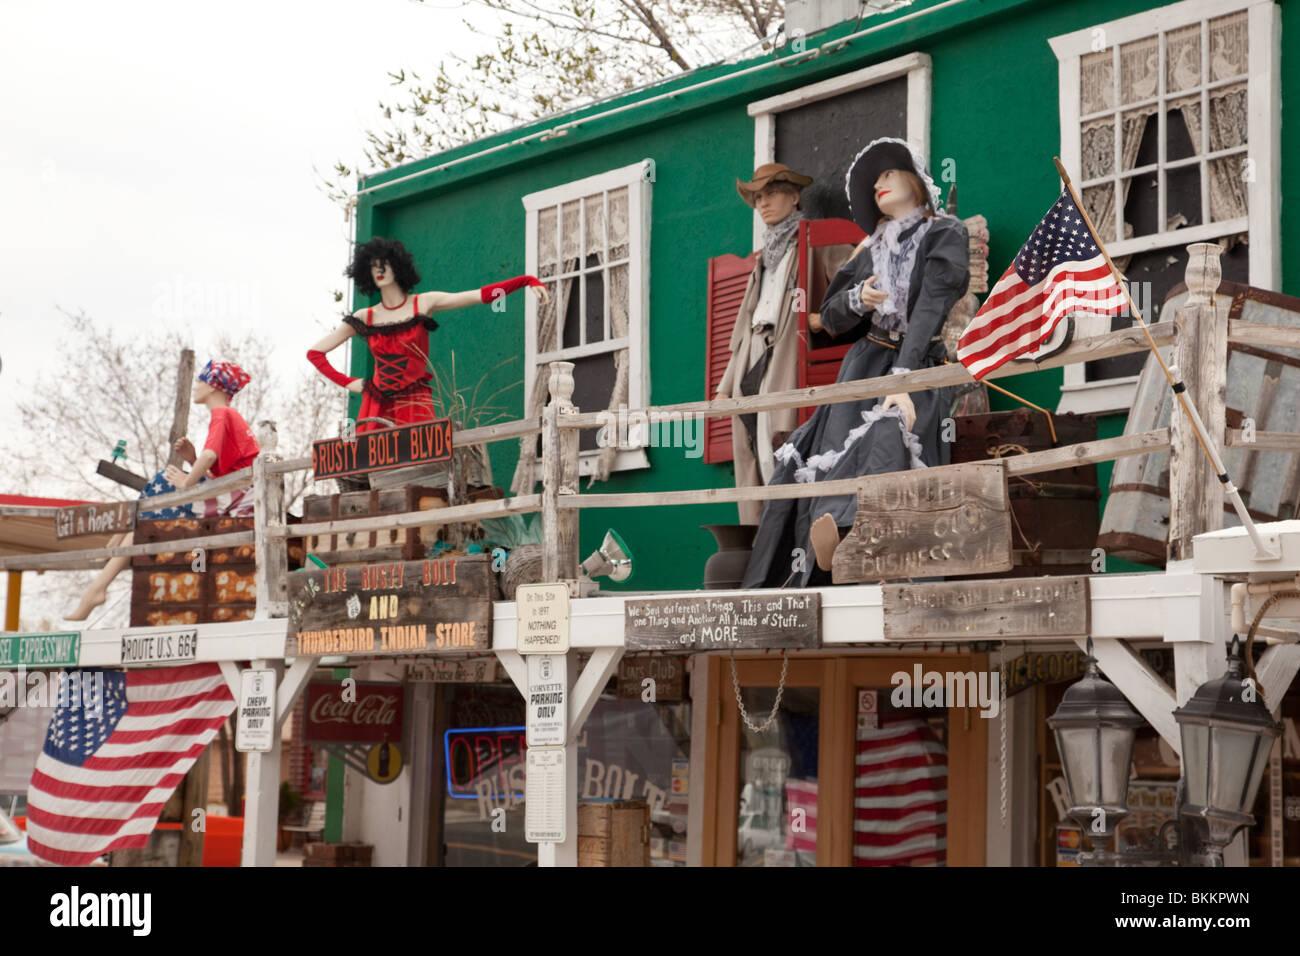 Route 66 tourist attraction. Seligman, Arizona, USA - Stock Image